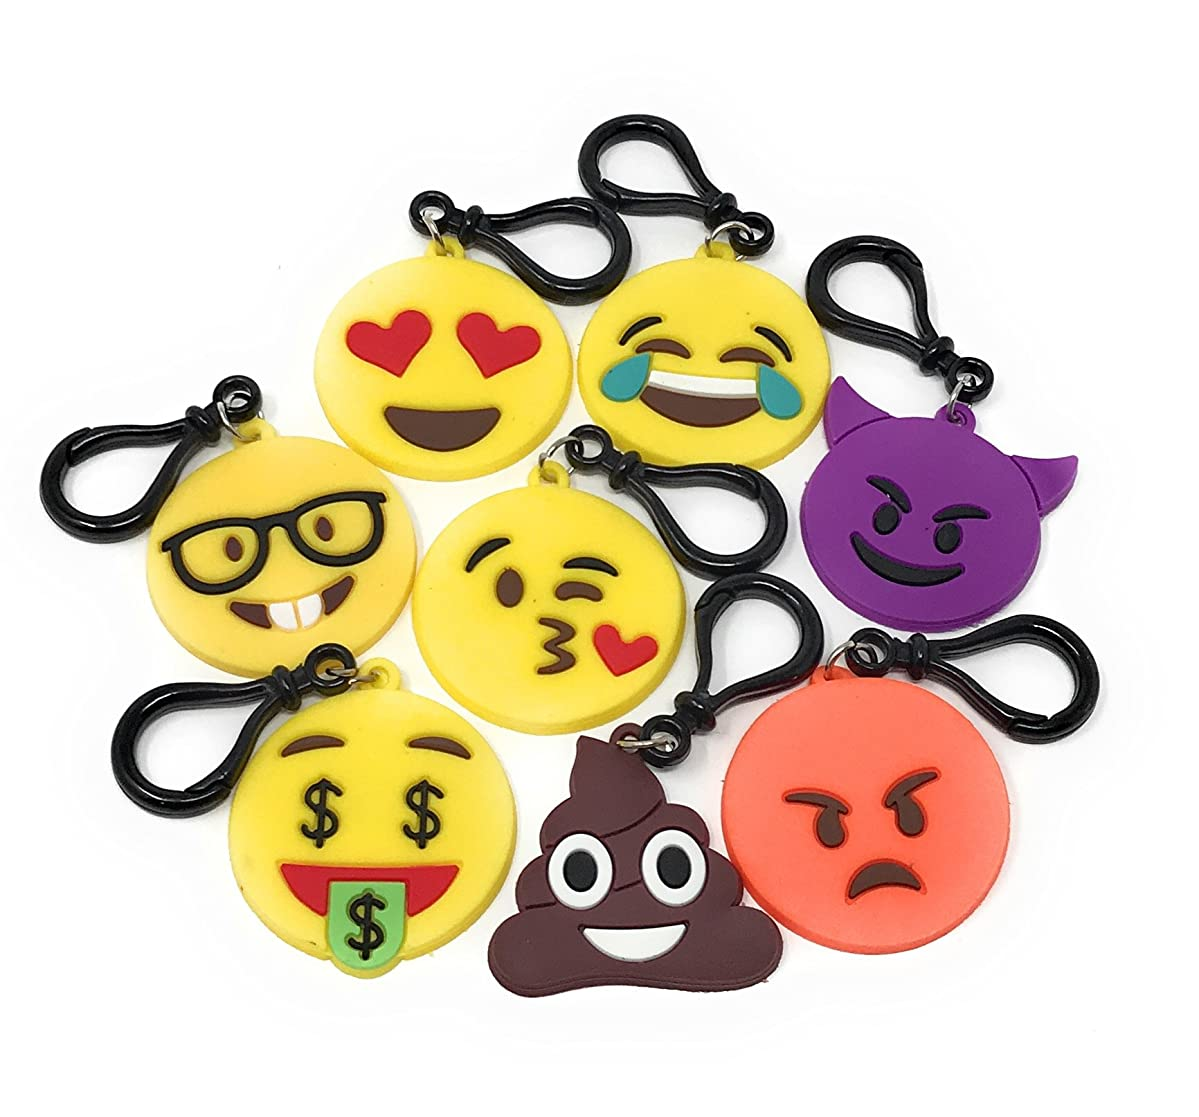 Sea View Treasures 24 Bulk Silicon Emoji Party Favor Key Chain / Bag Tag